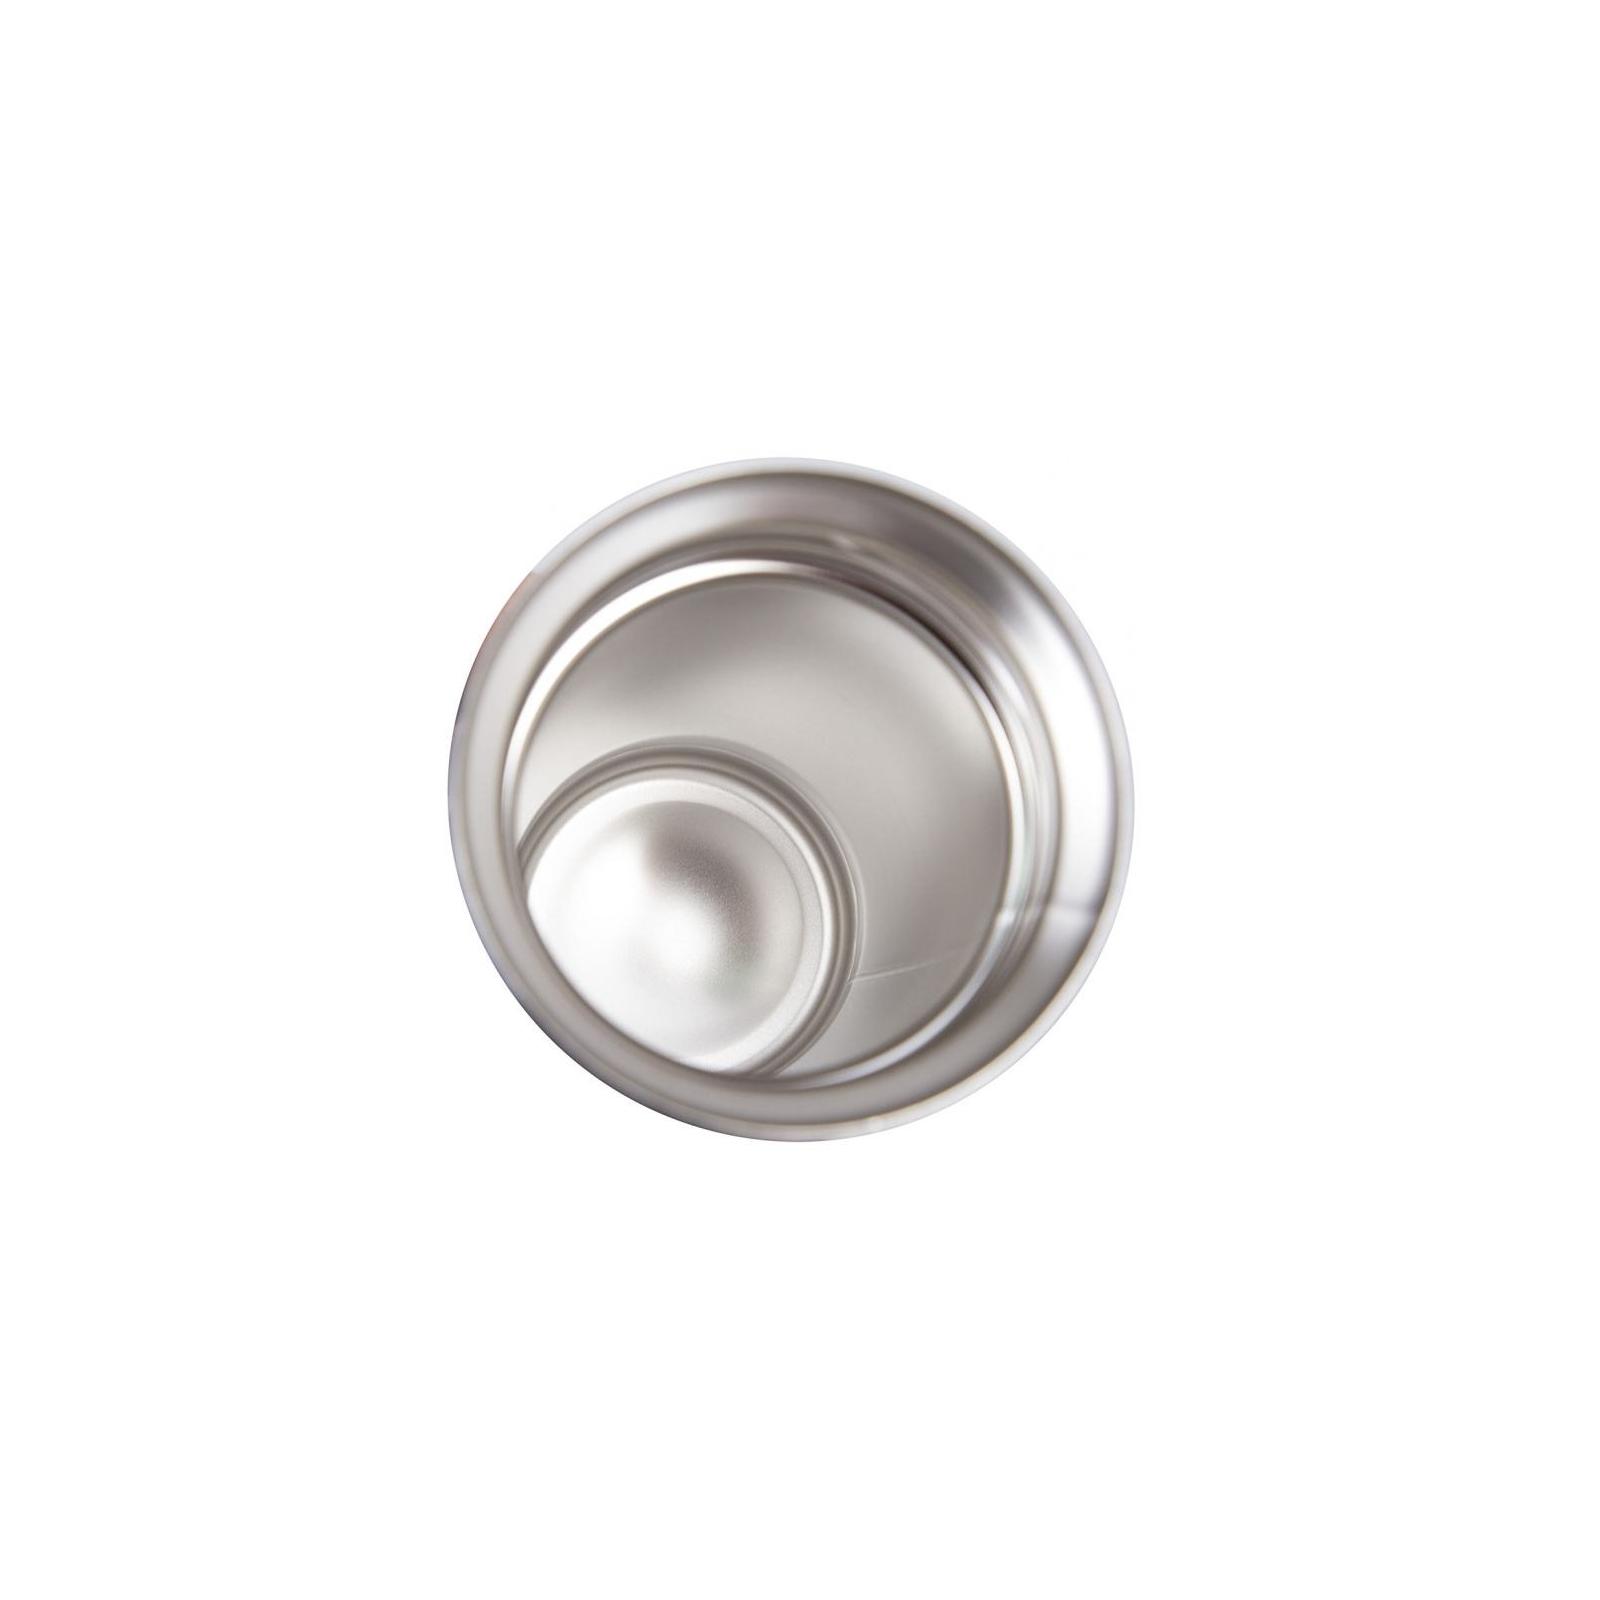 Термокружка Tefal TRAVEL MUG 0.36L raspb/silver (K3087114) изображение 4